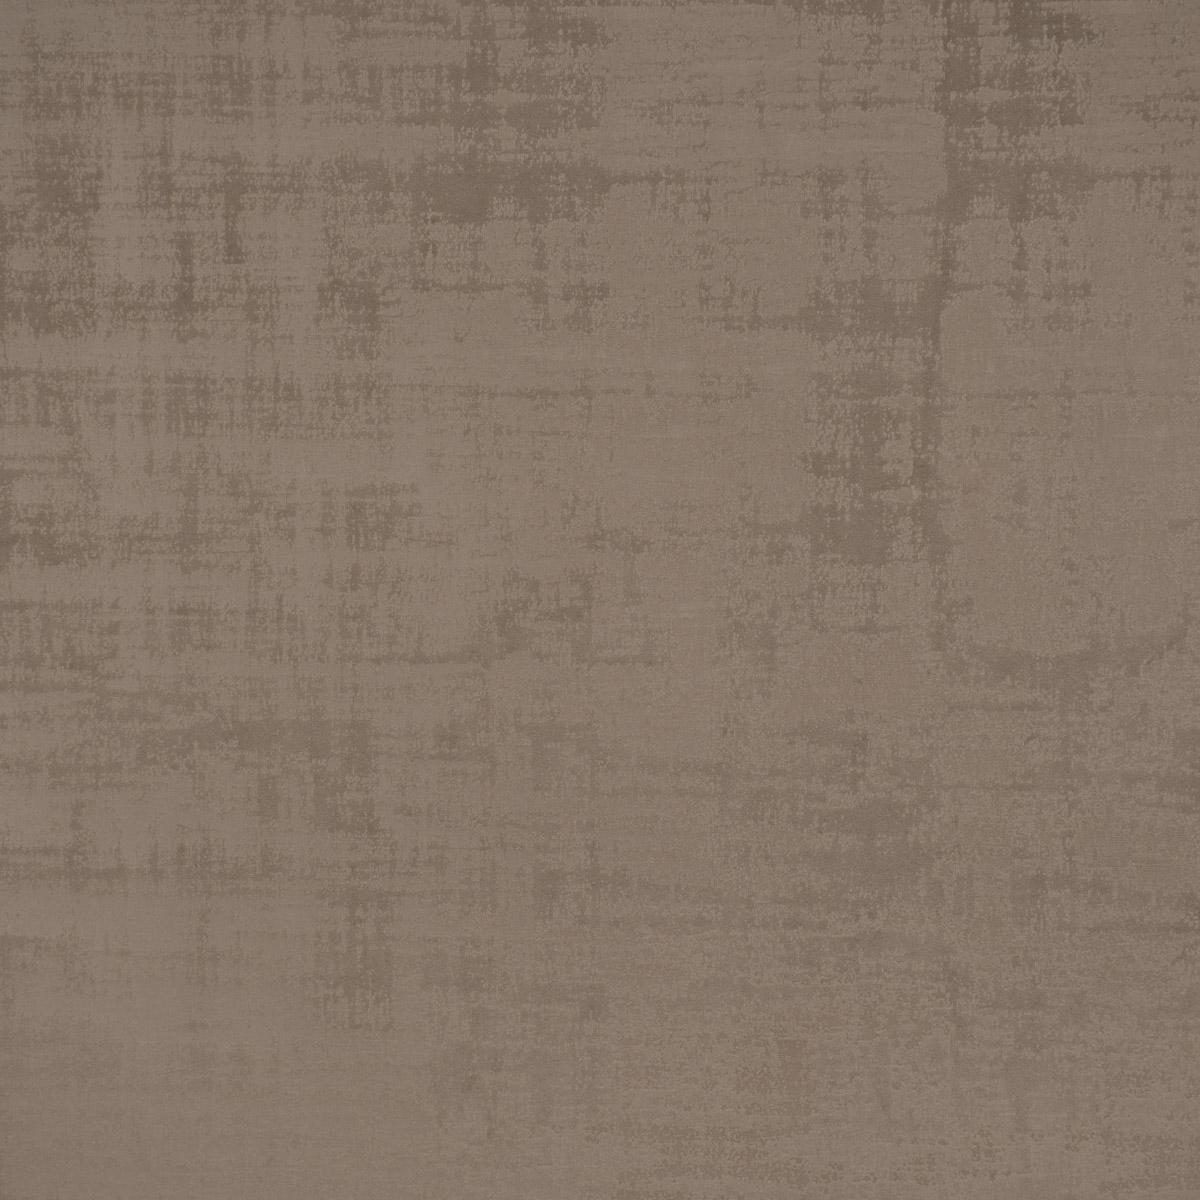 Samtstoff Dekostoff Velvet Marble Samt mit Struktur uni sand 1,40m Breite